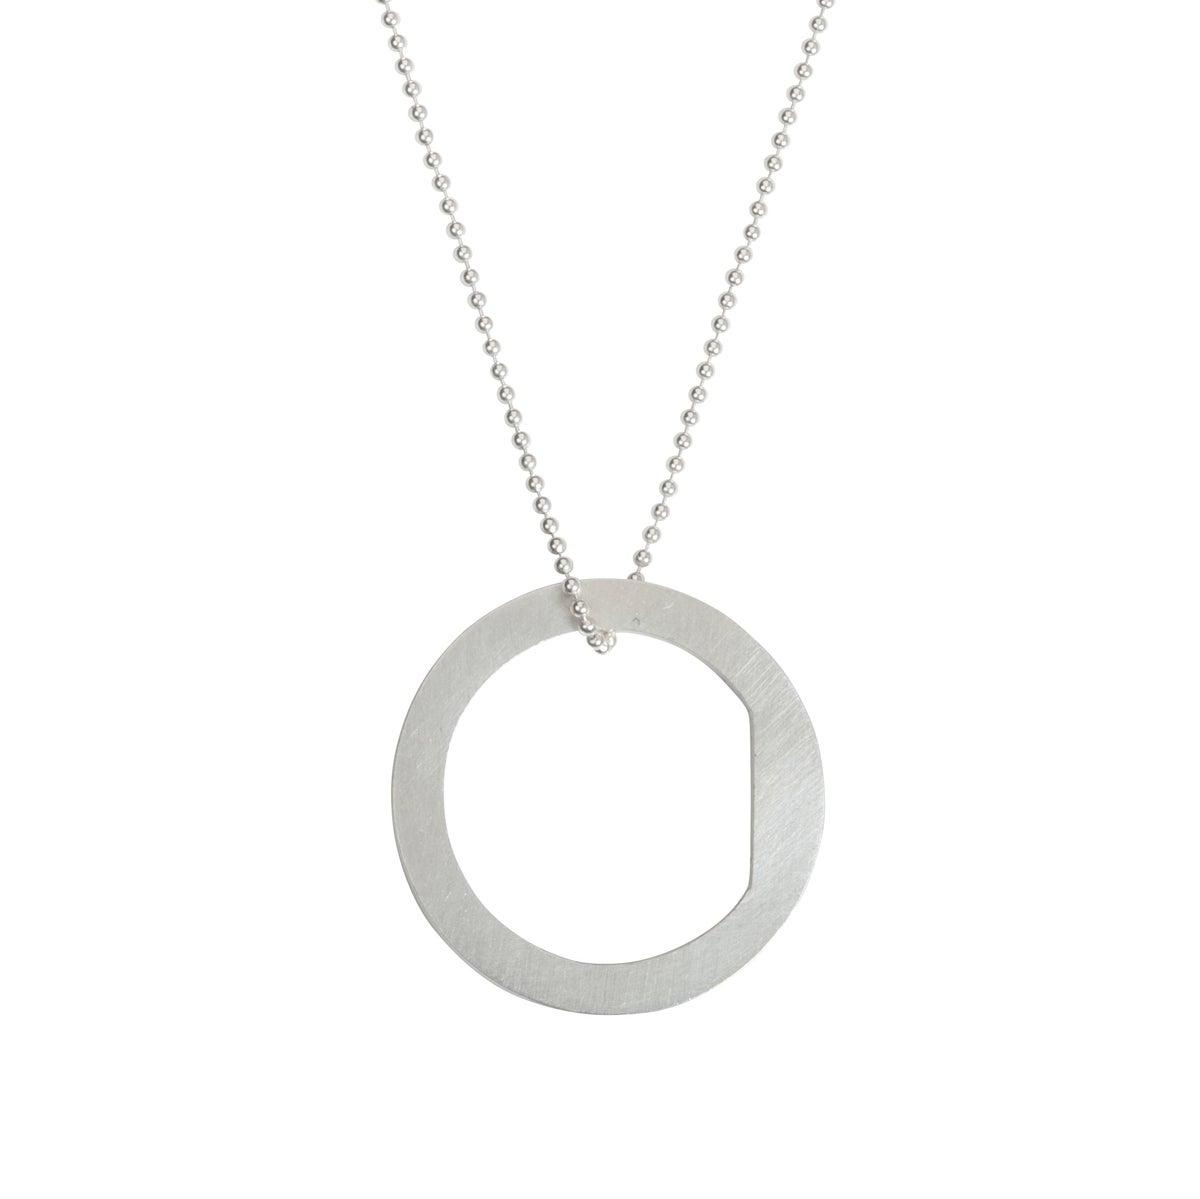 Image of Convertible necklace/ring 'Circle+|- #1 Block'